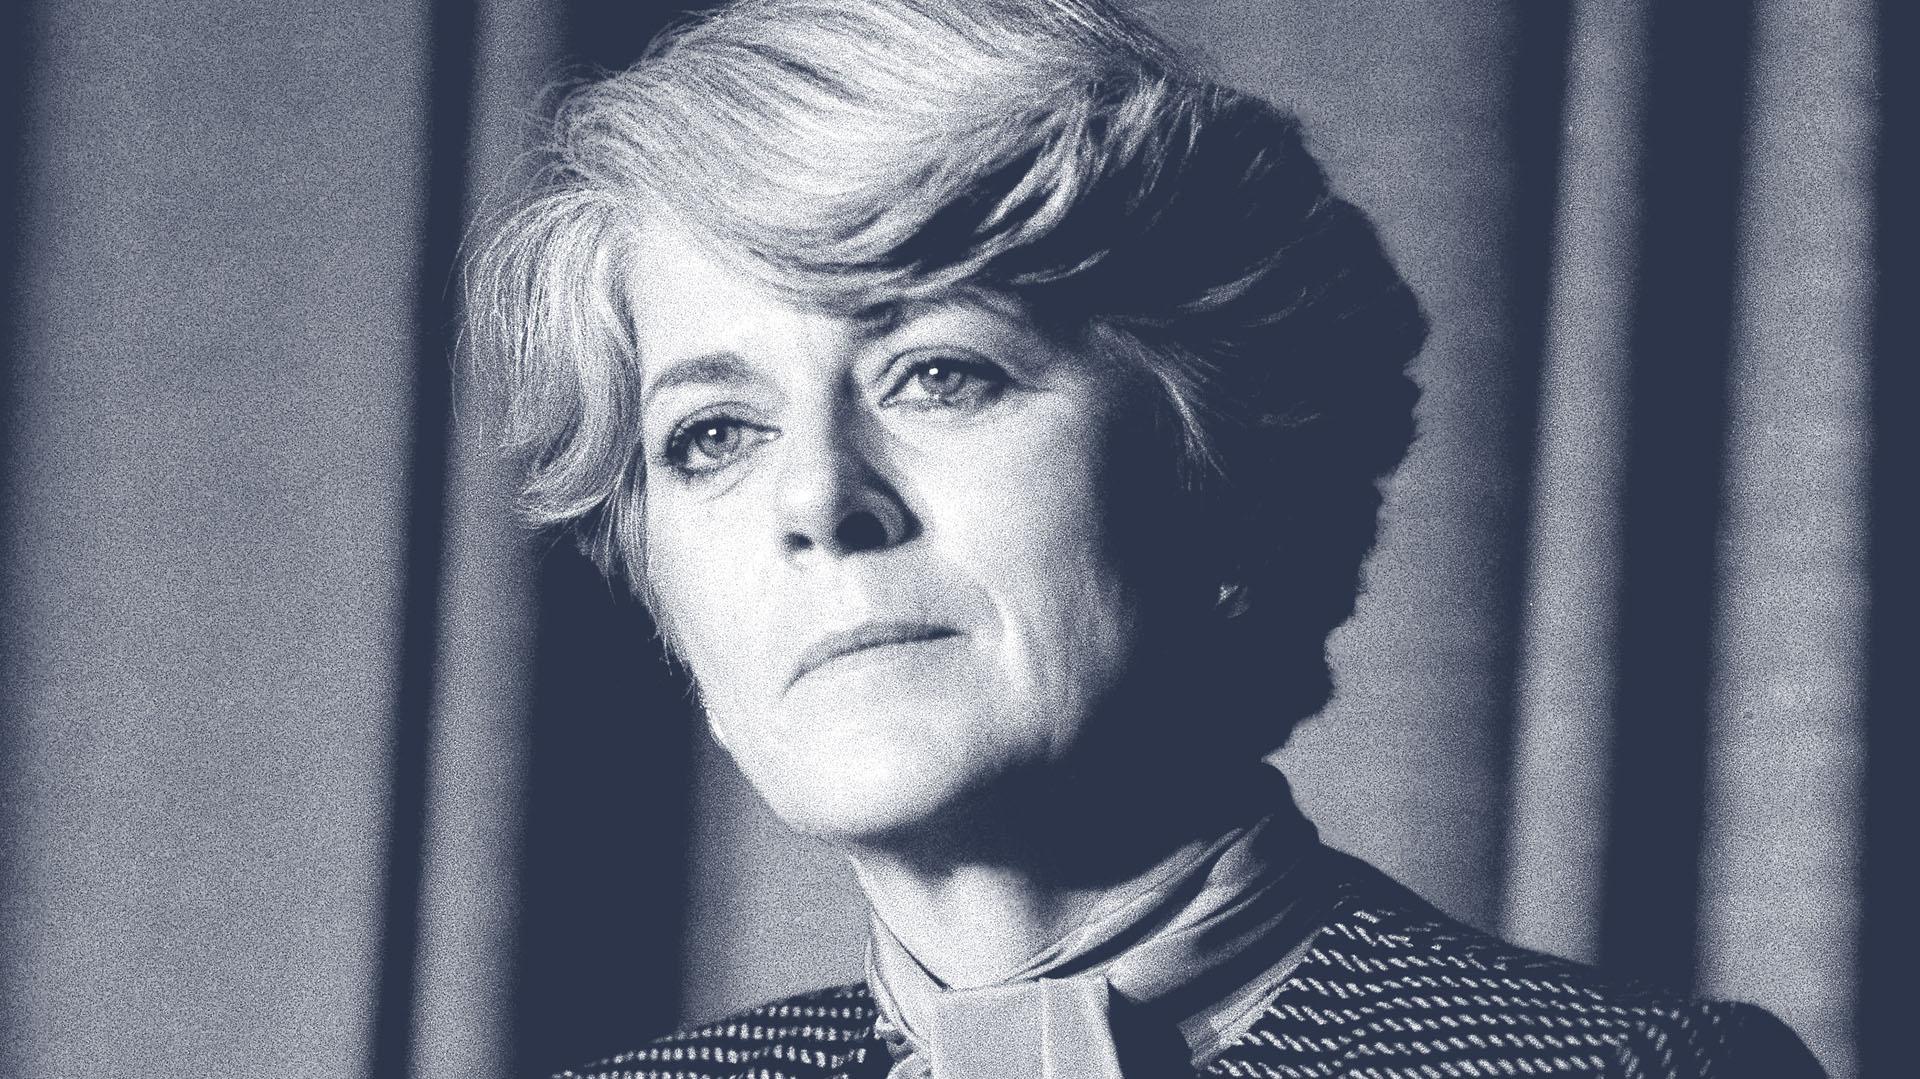 Geraldine Ferraro